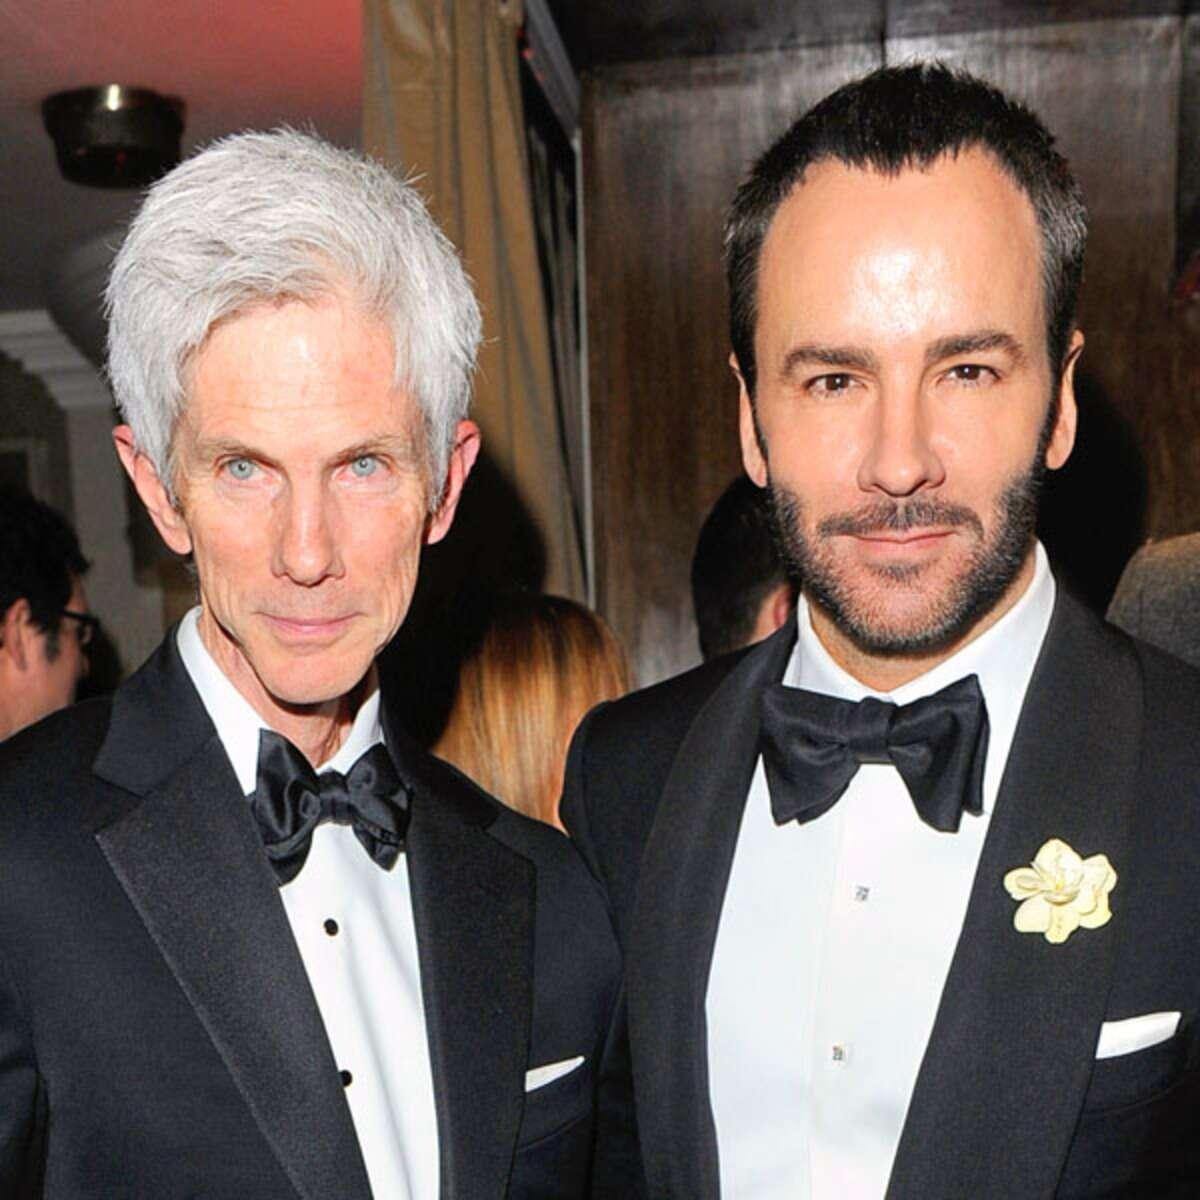 Tom Ford's husband, fashion journalist, Richard Buckley dies at 72